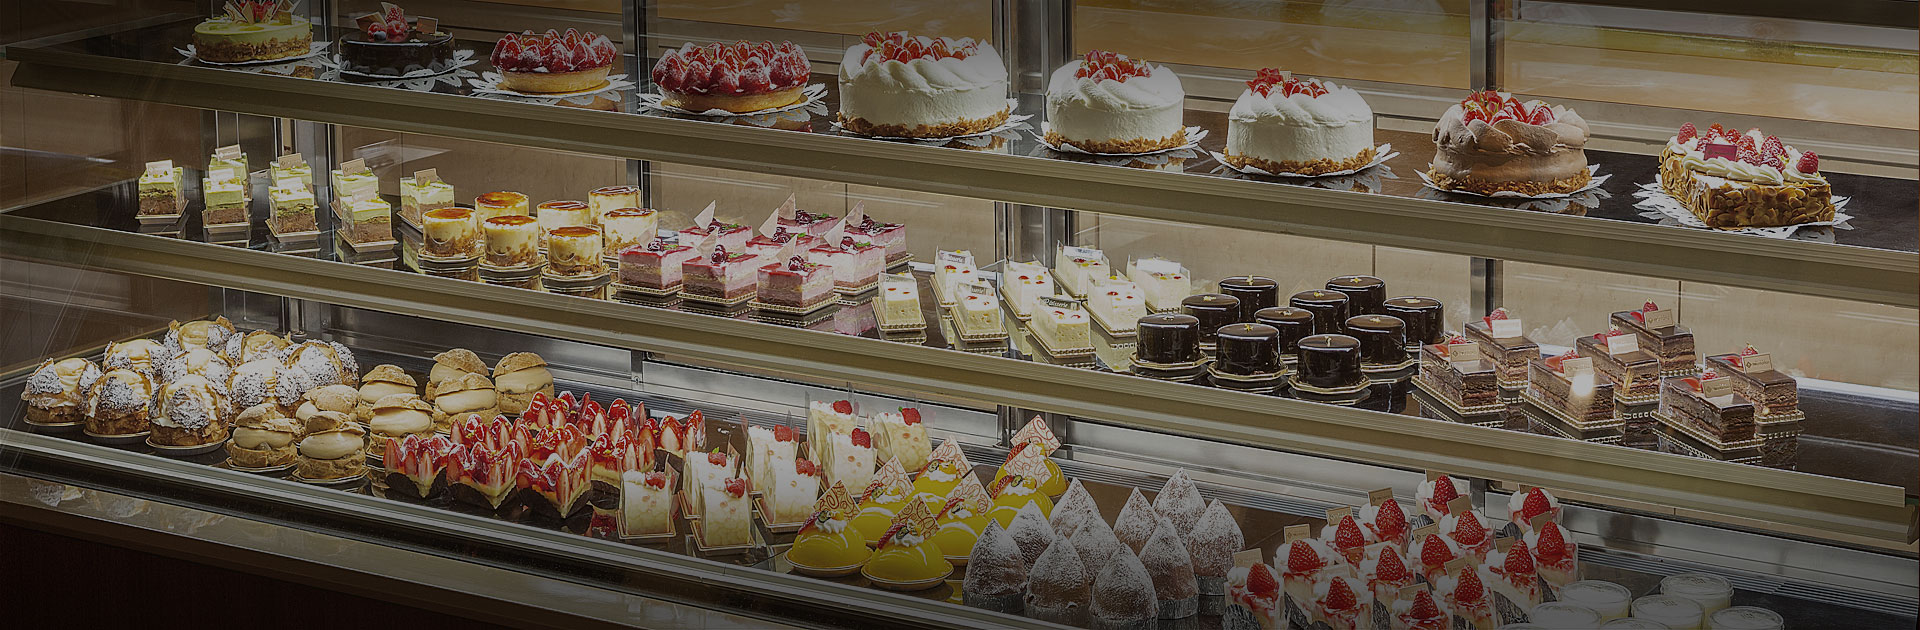 Bakery & Cake